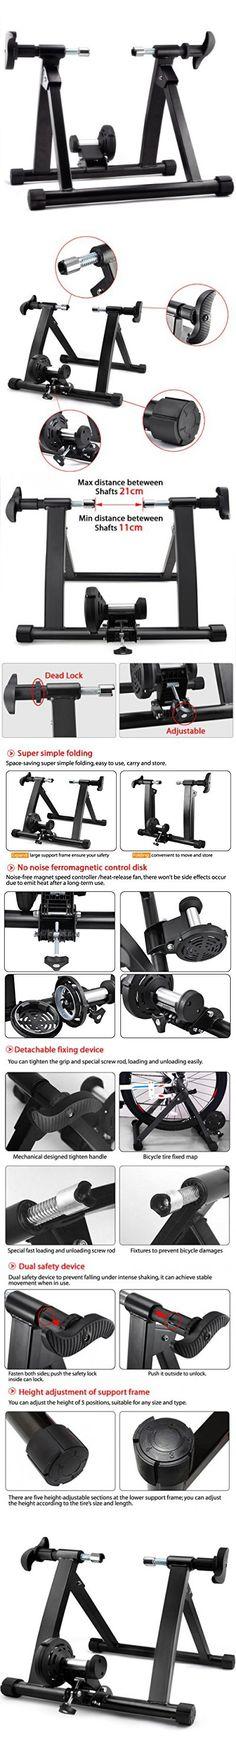 Yaheetech Premium Steel Bike Bicycle Indoor Exercise Trainer Stand